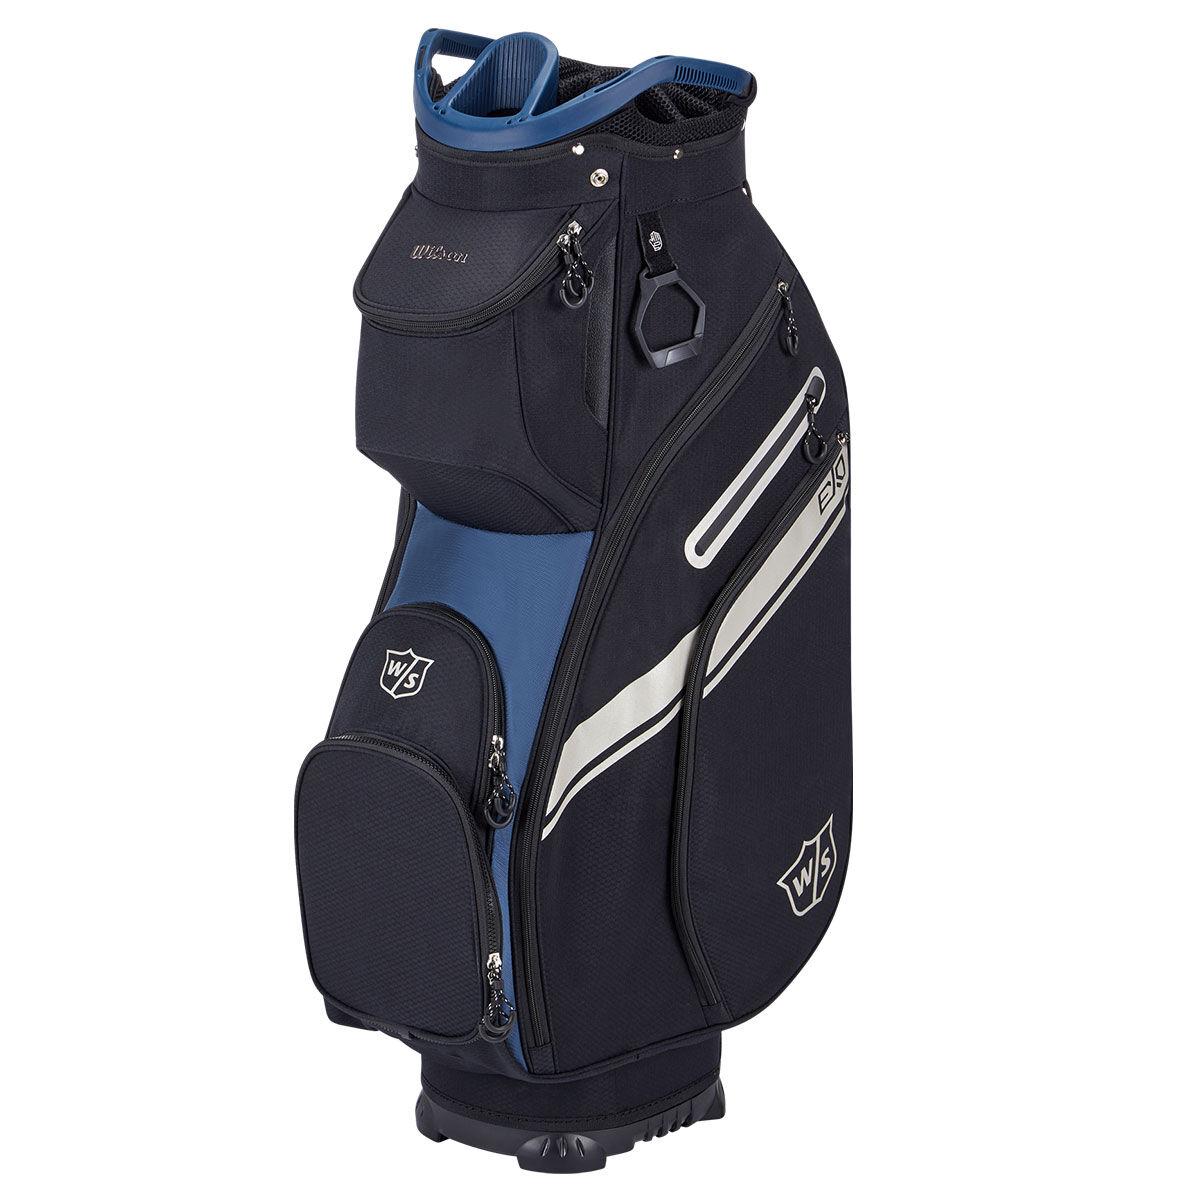 Wilson Staff EXO II Golf Cart Bag, Black/blue, One Size | American Golf